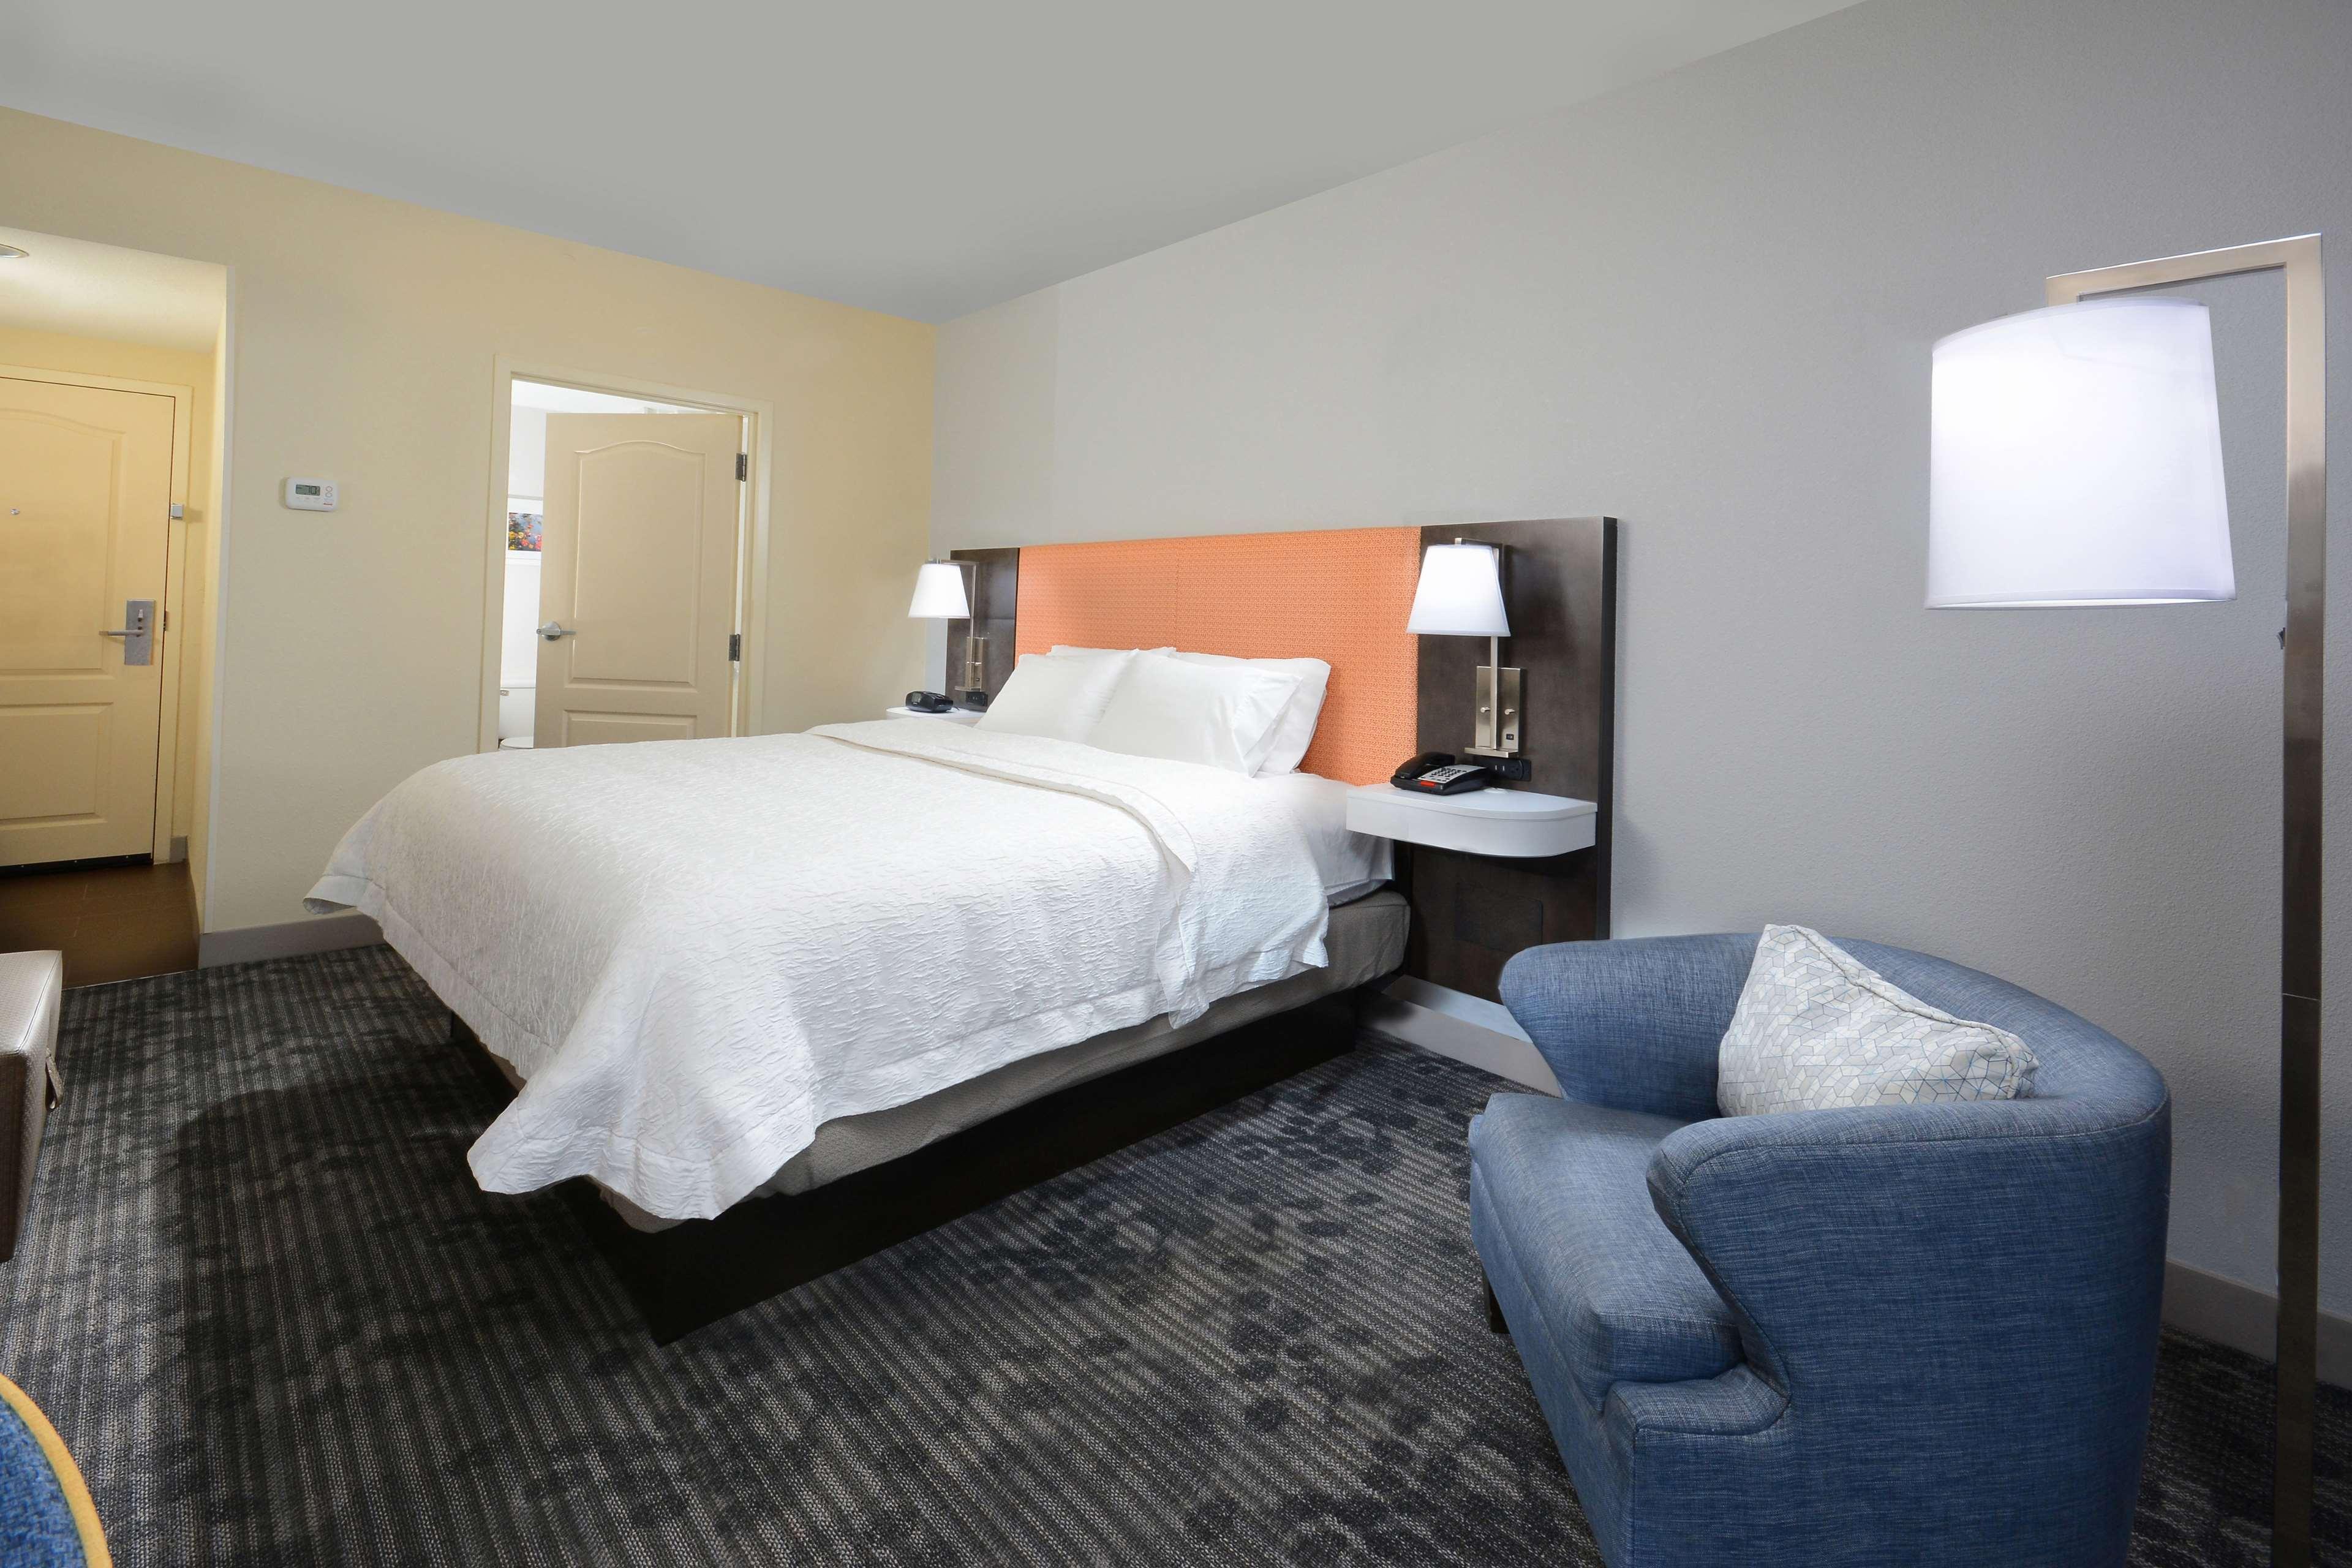 Hampton Inn & Suites Greenville/Spartanburg I-85 image 36